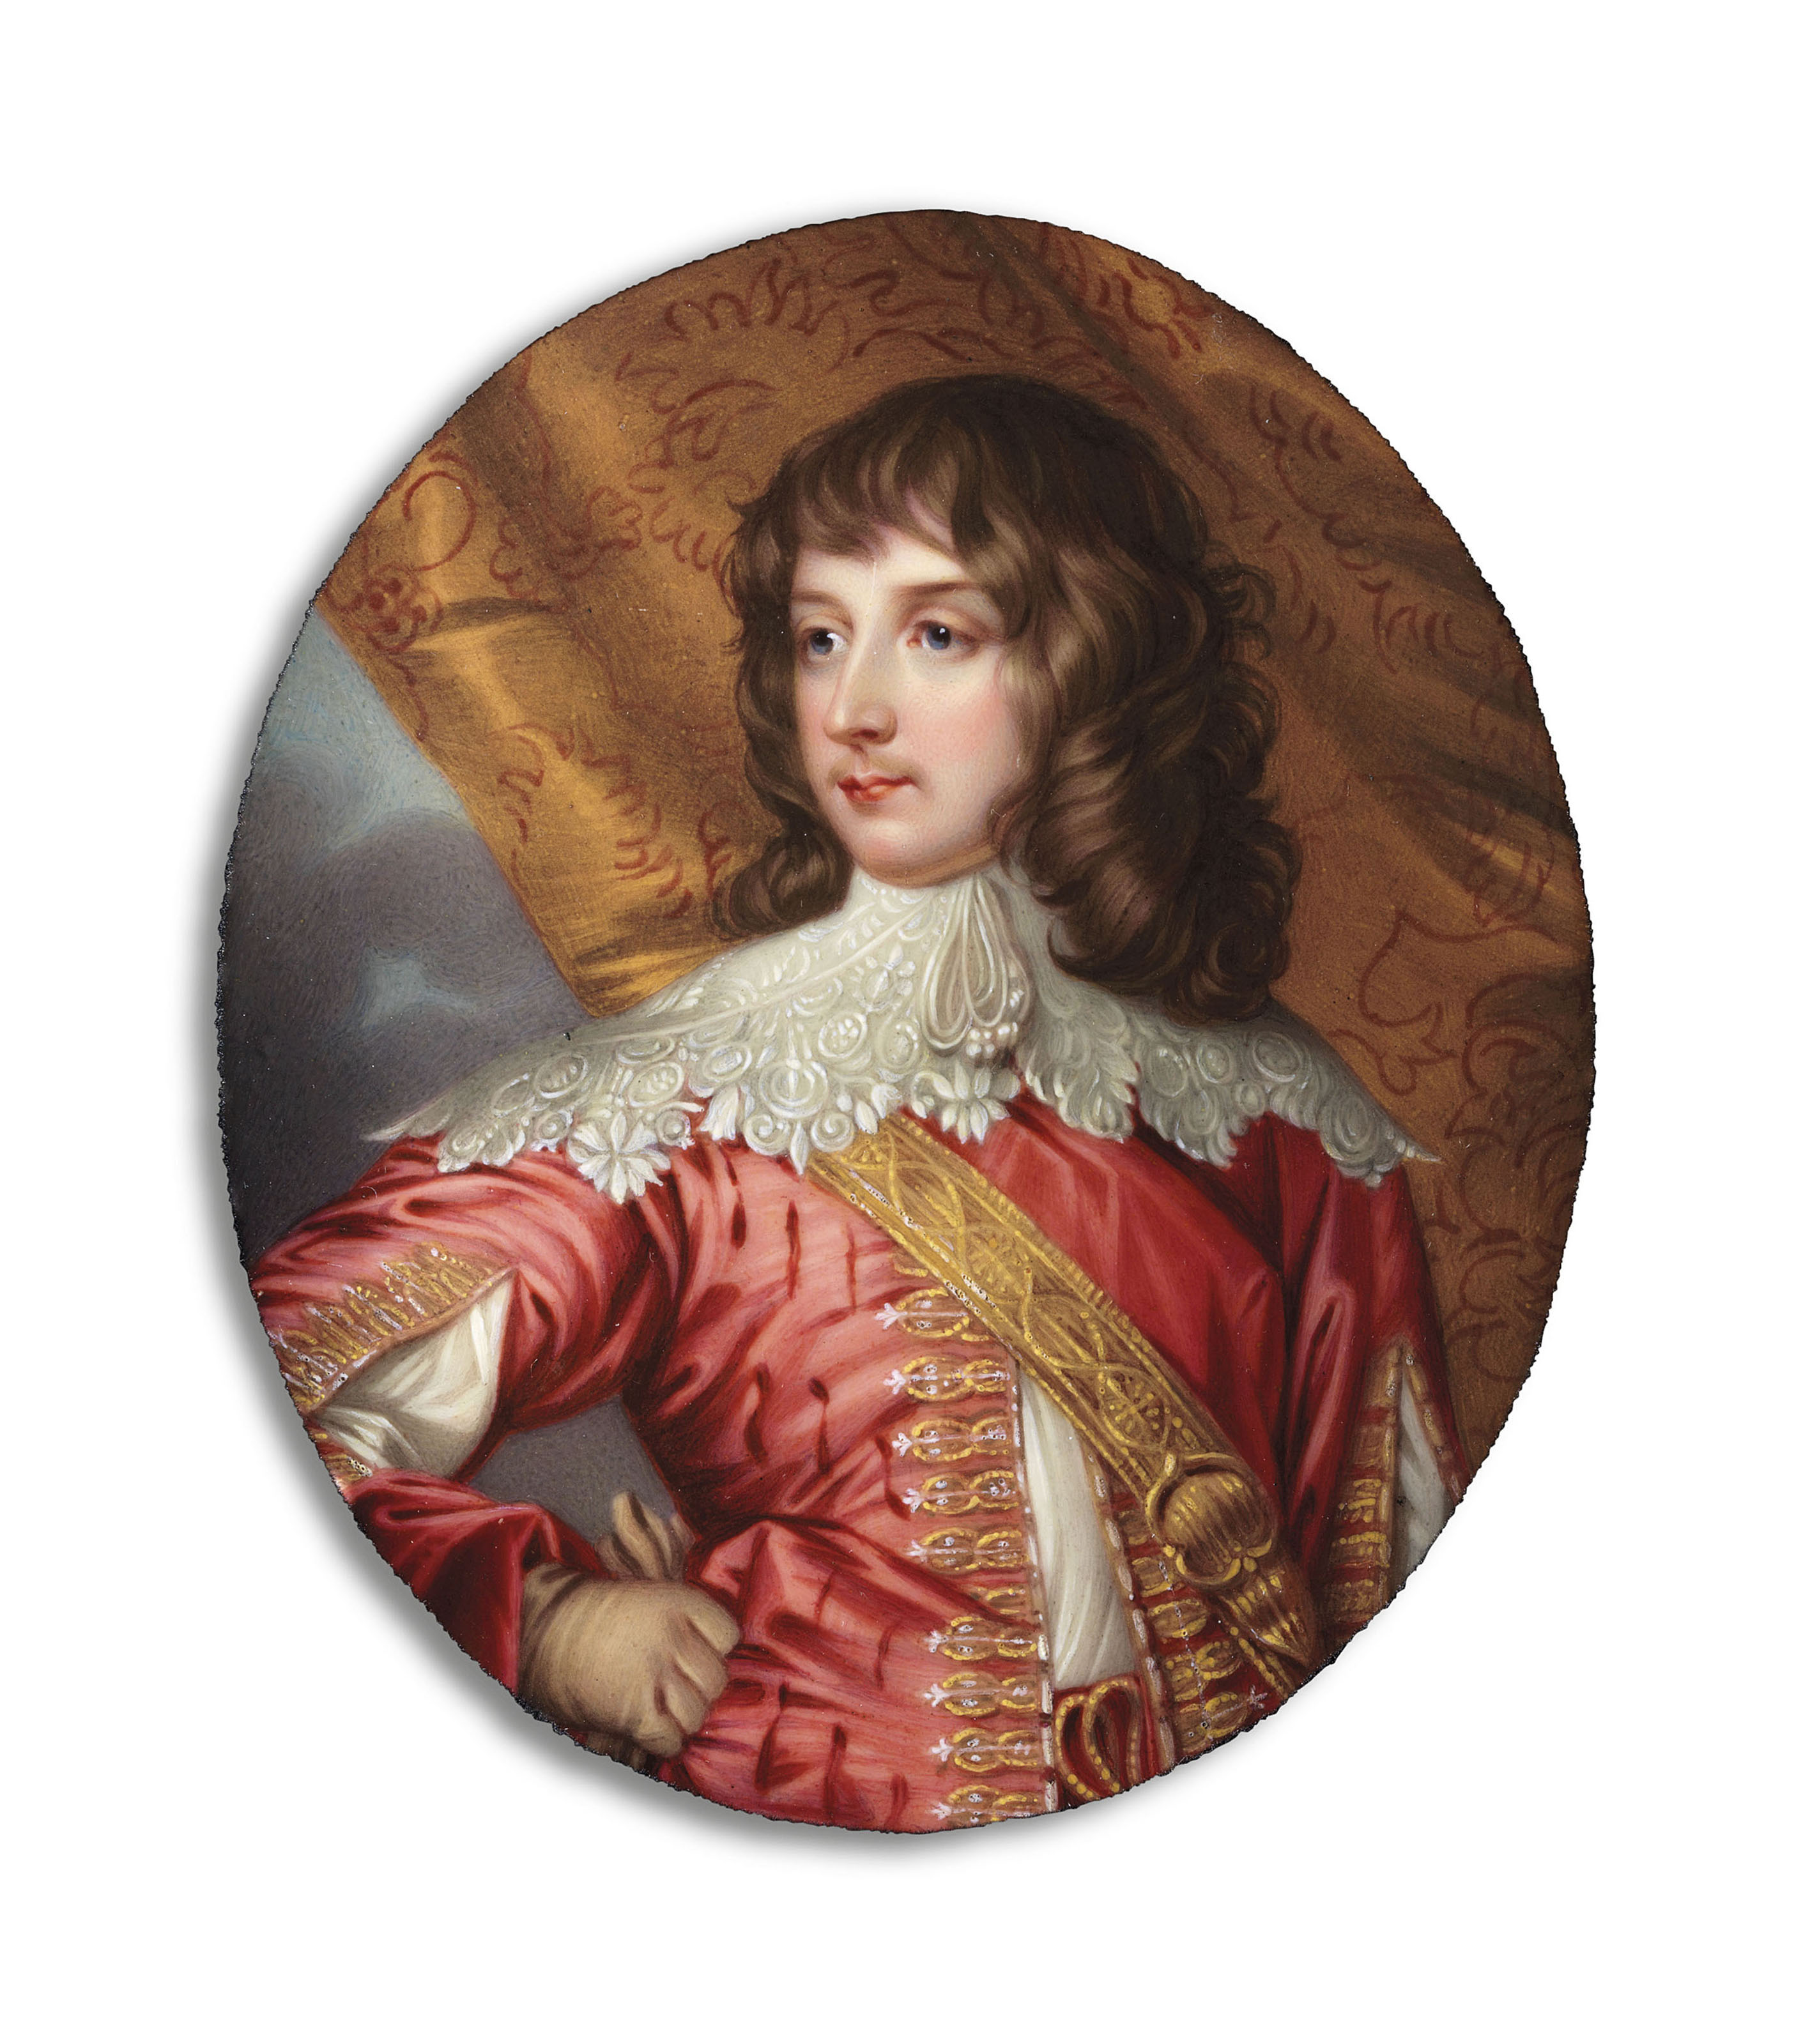 Henry Pierce Bone (British, 1779-1855) After Sir Anthony